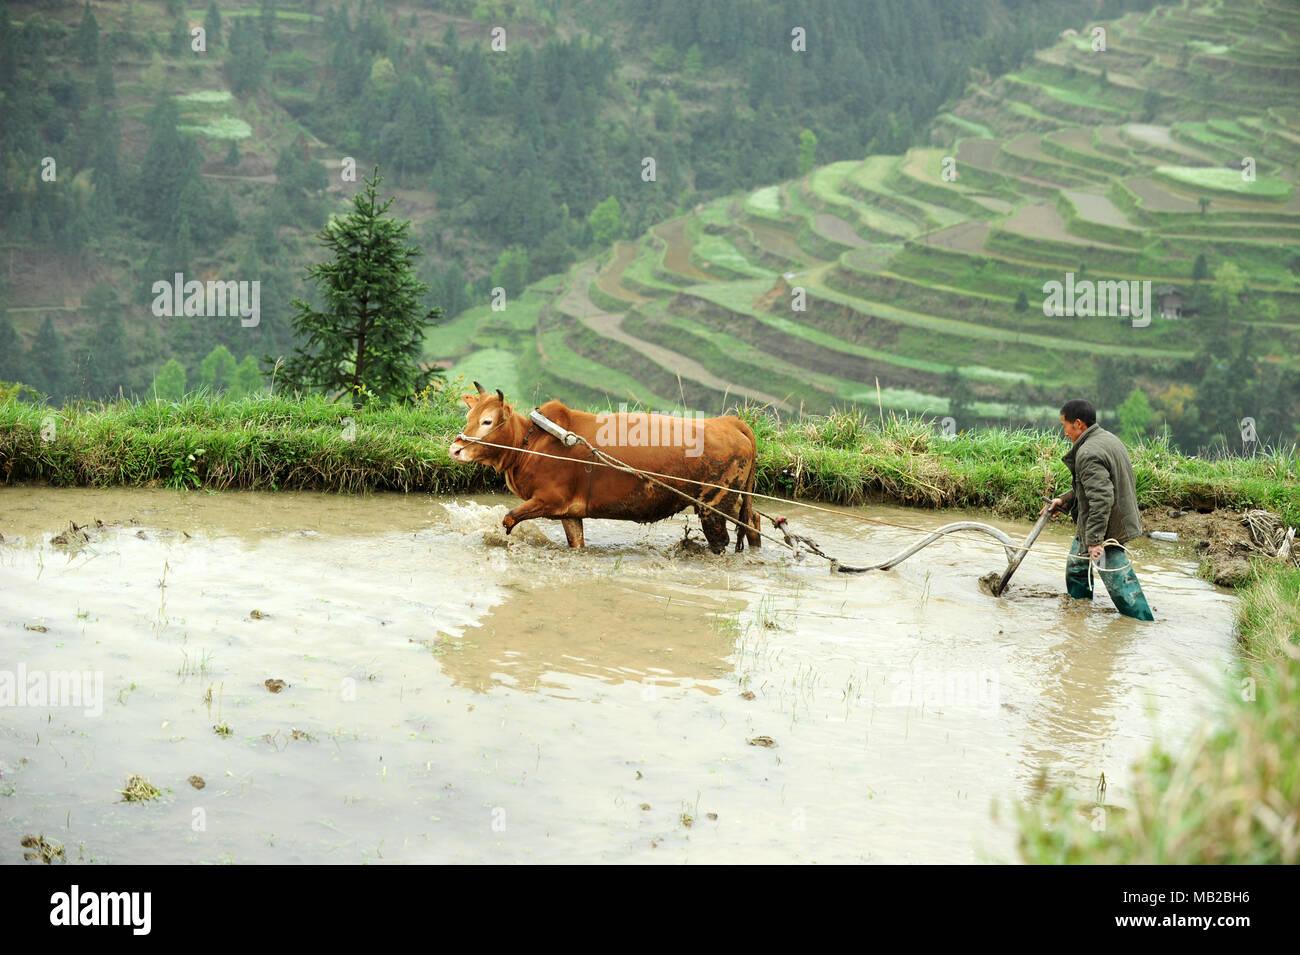 Jinping, China's Guizhou Province. 6th Apr, 2018. A farmer ploughs the field at Dongzhuang Village of Guben Town in Jinping County, southwest China's Guizhou Province, April 6, 2018. Credit: Yang Wenbin/Xinhua/Alamy Live News - Stock Image